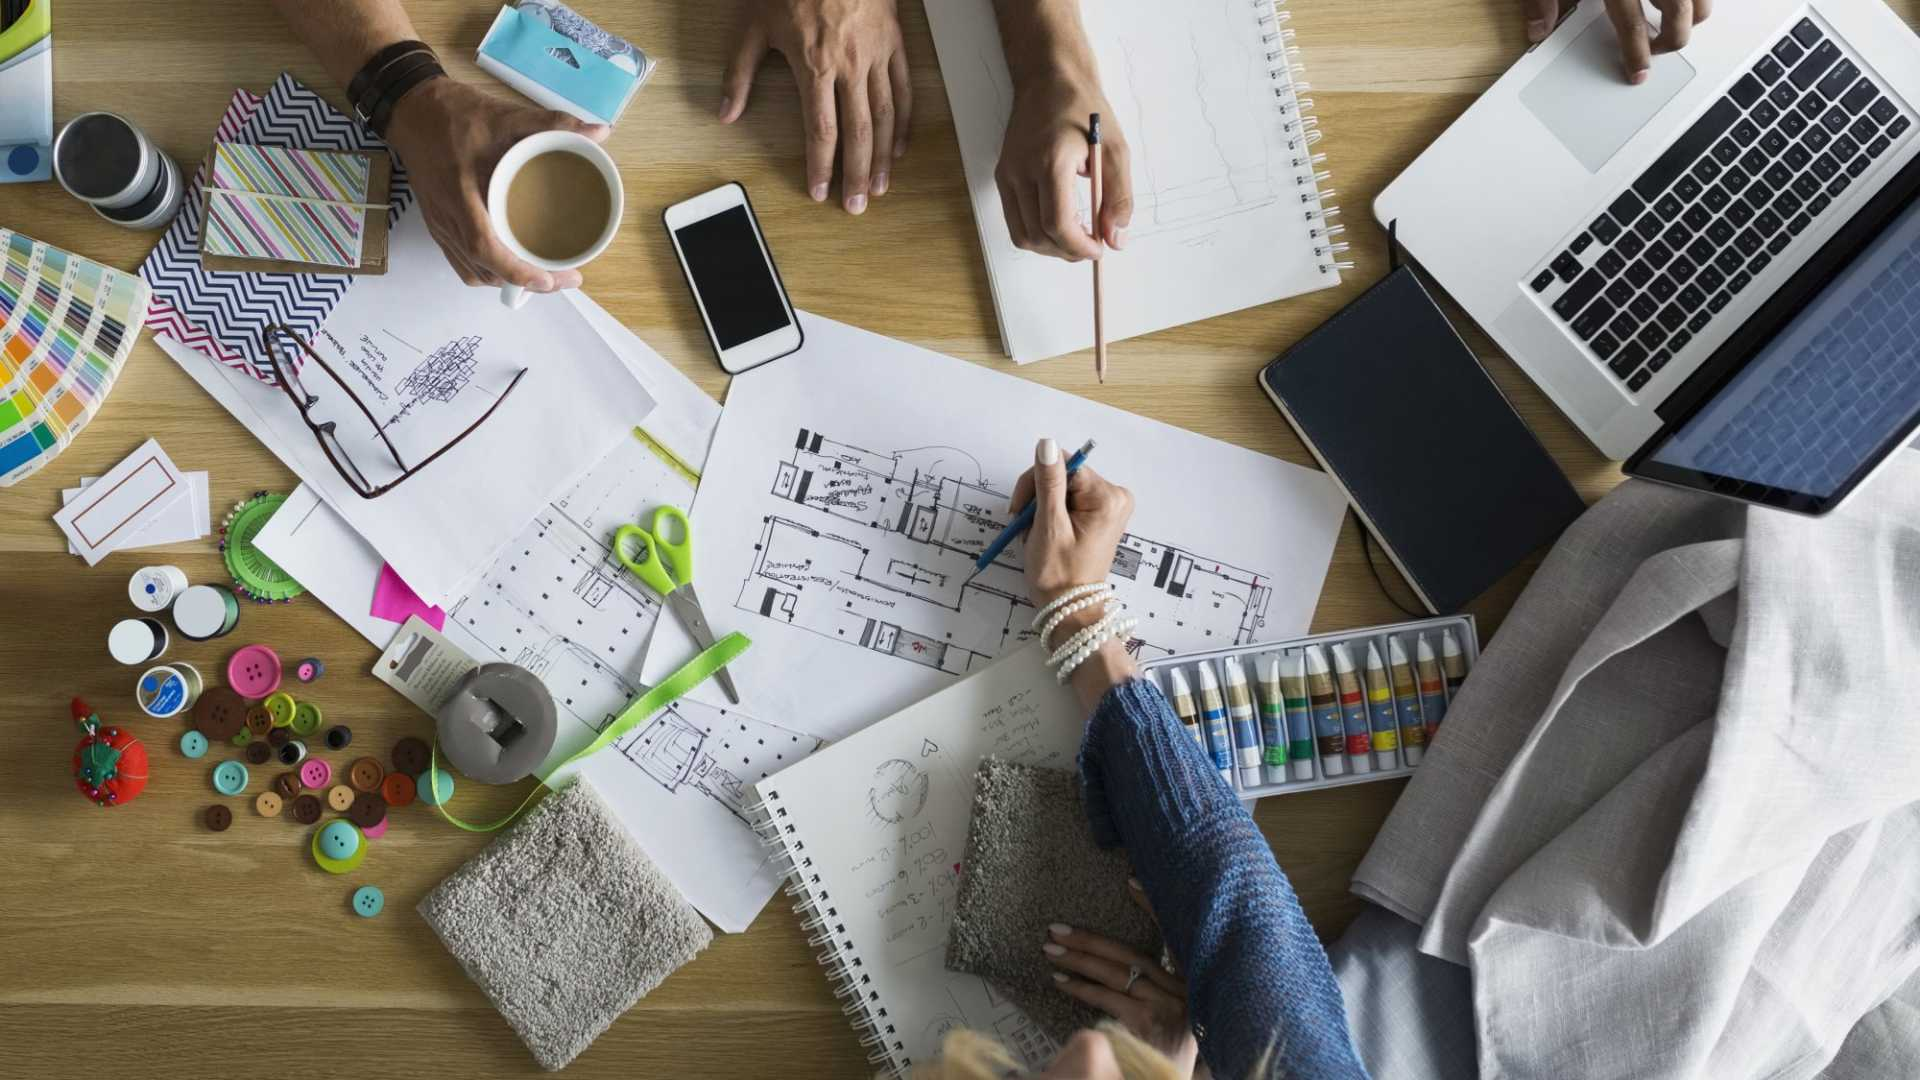 Fearless Creativity, How to Nurture the Big Idea